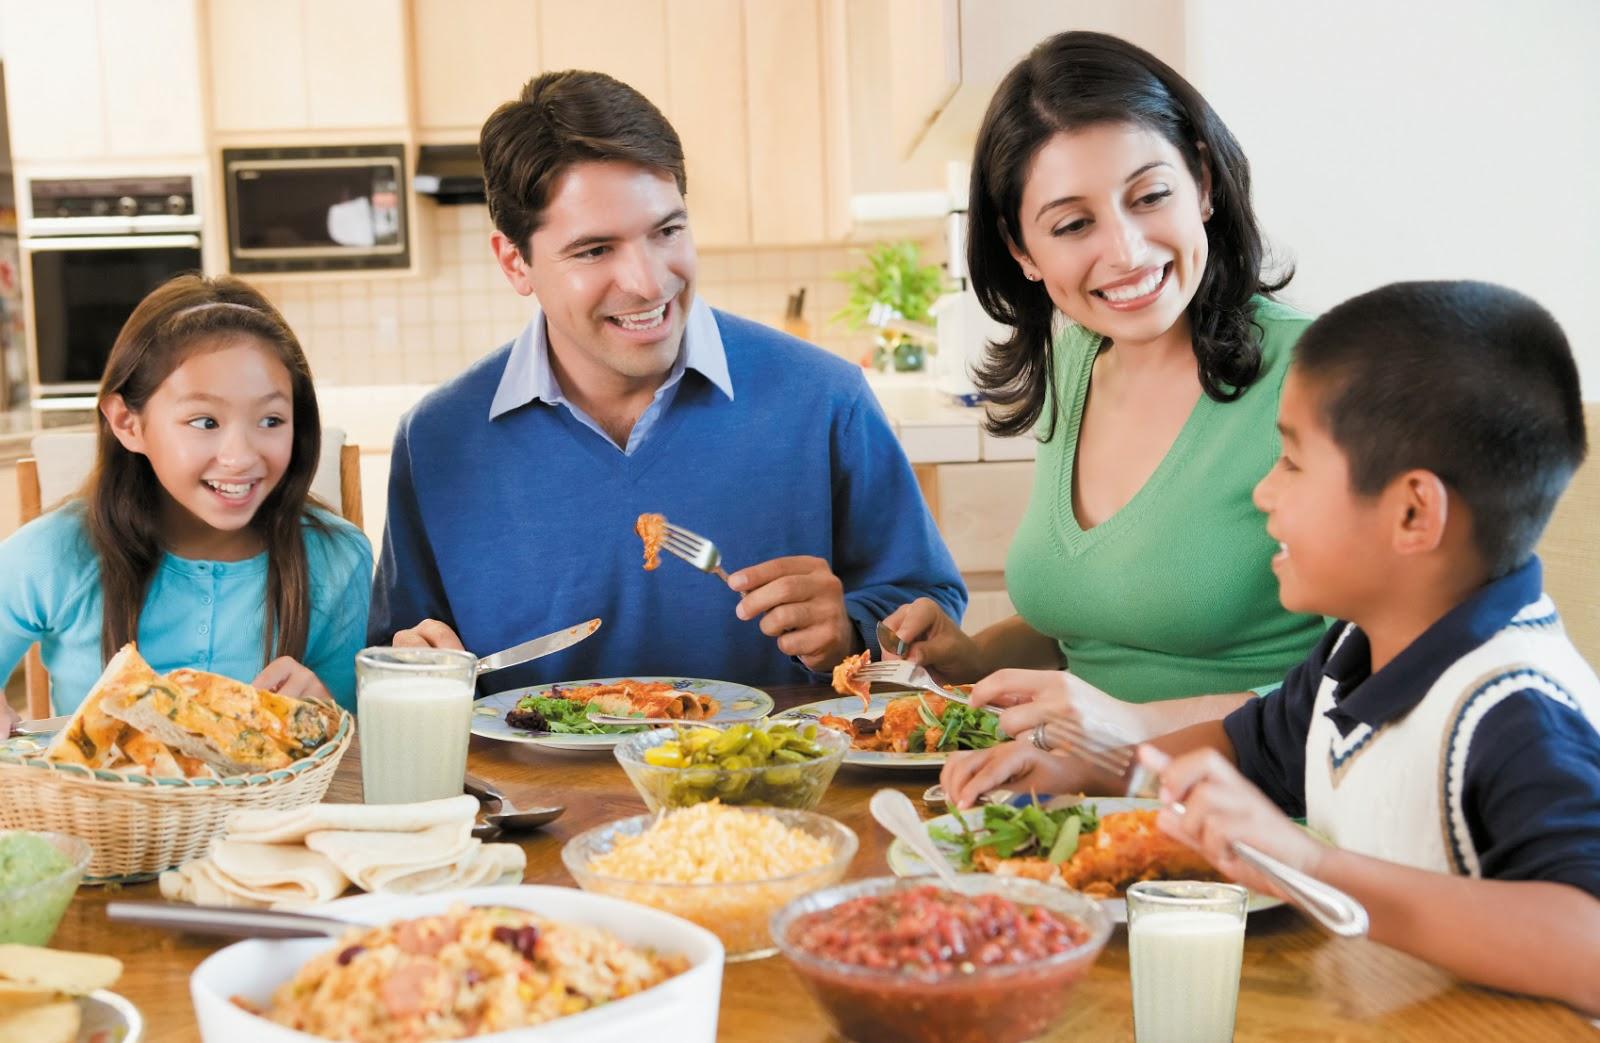 Fomenta la comida saludable